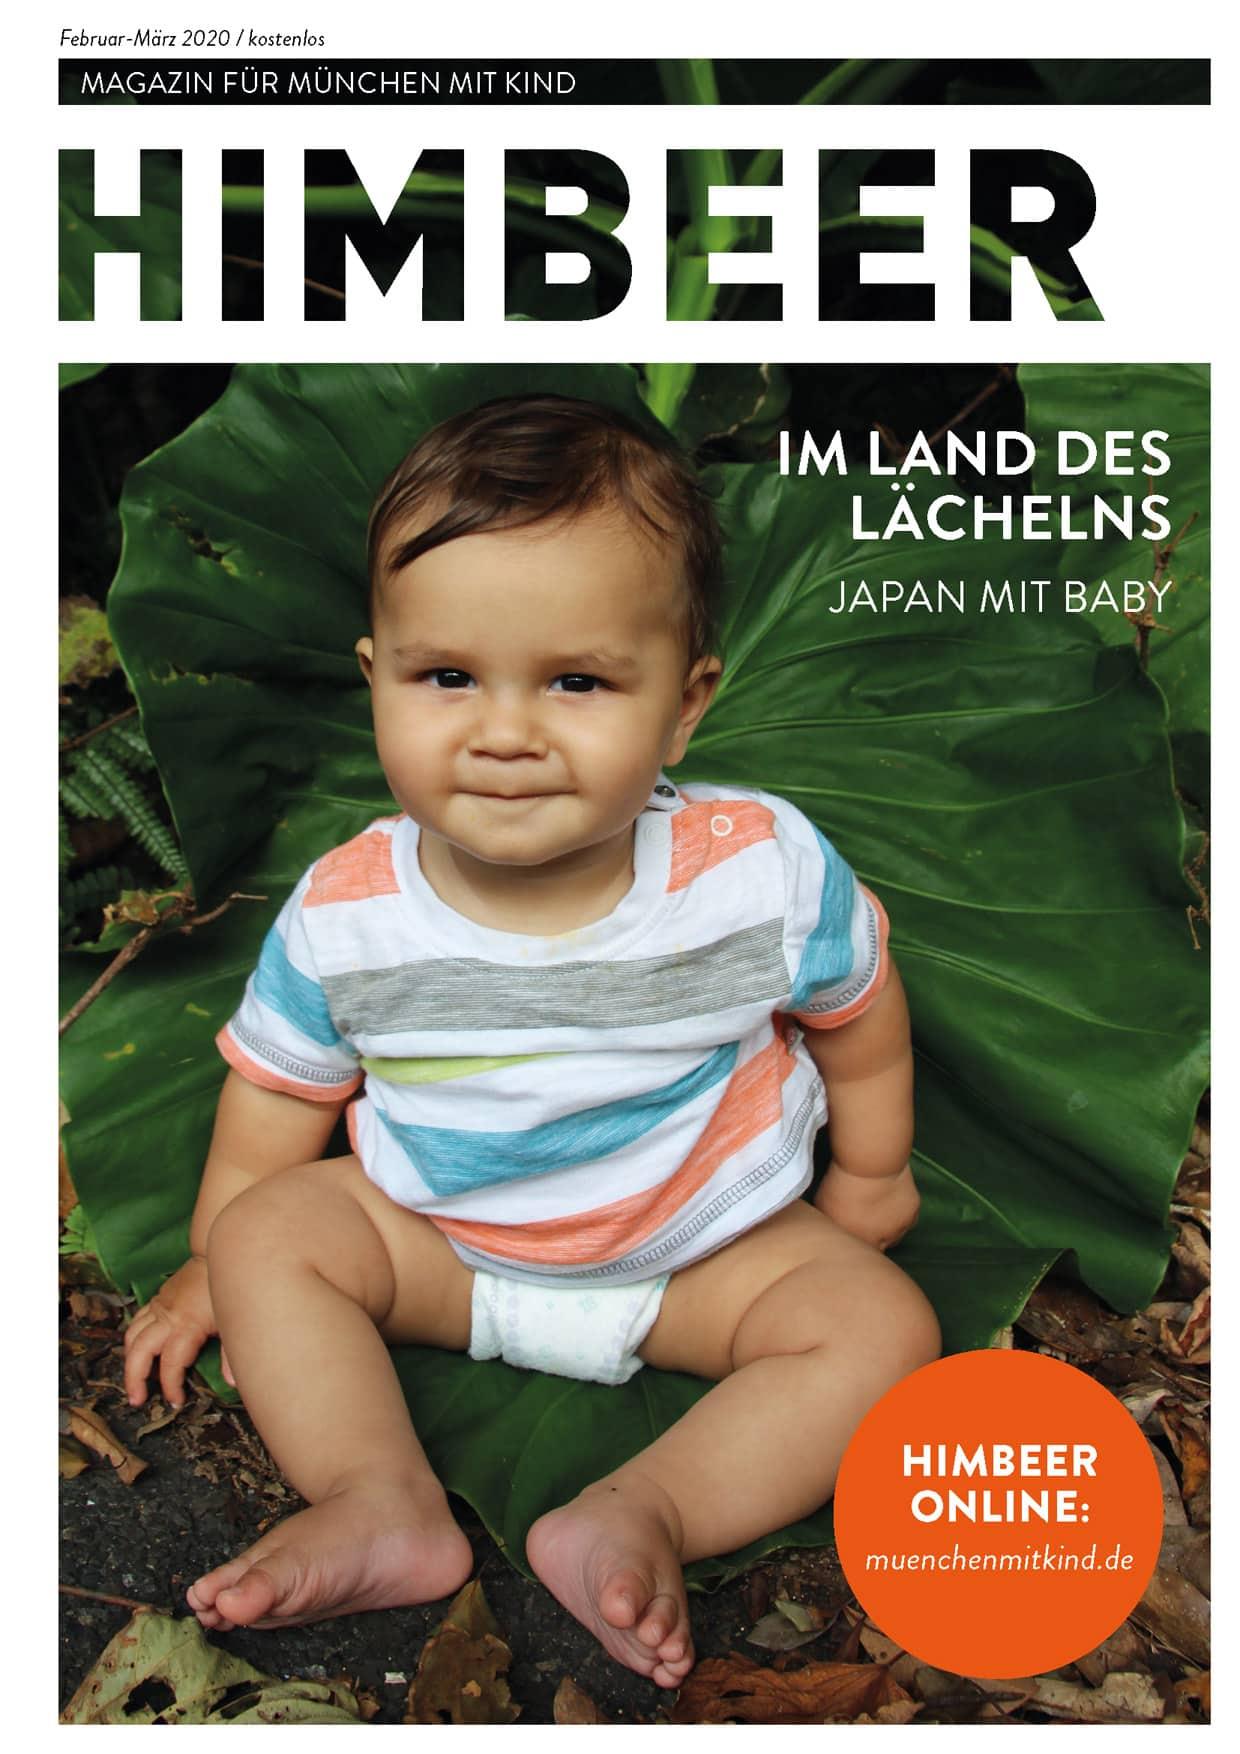 Familienmagazin HIMBEER München mit Kind Februar März 2020 // HIMBEER